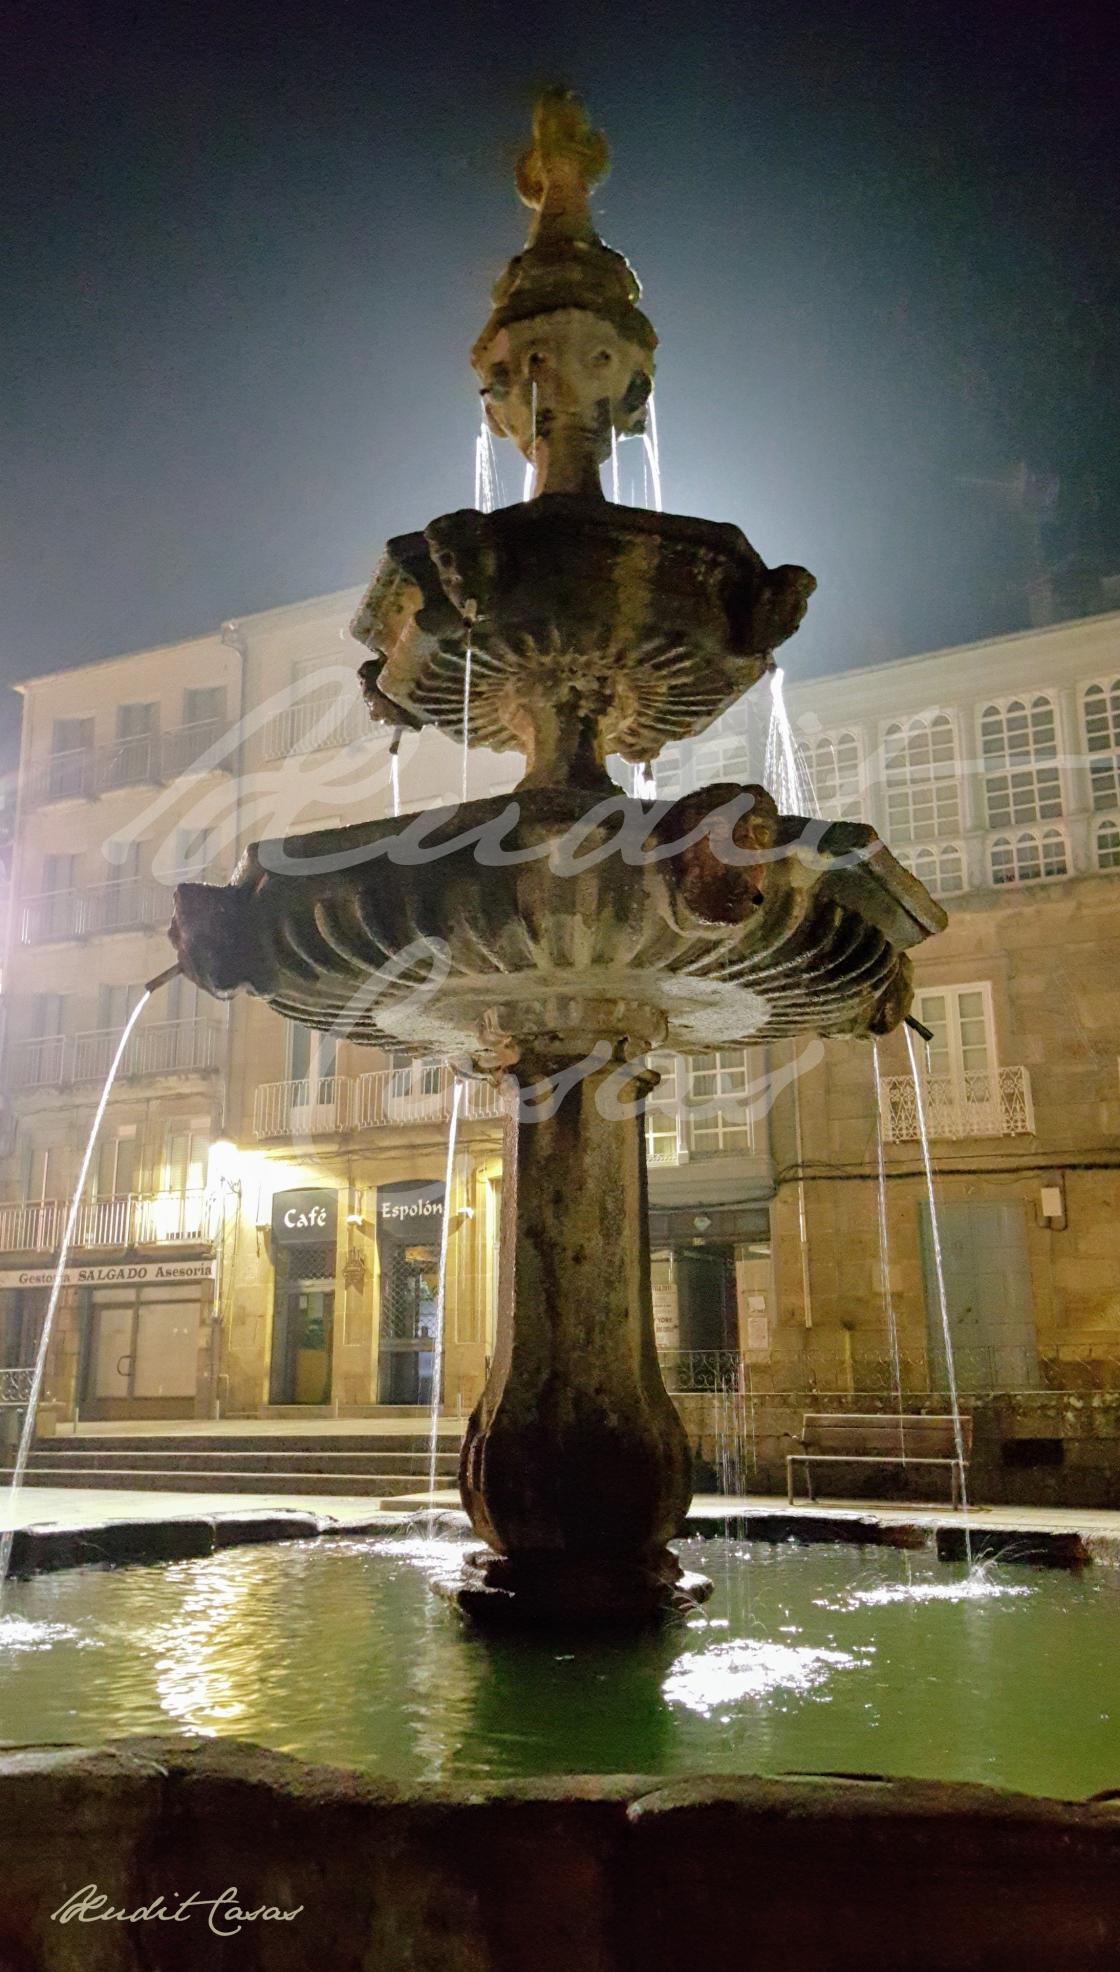 Curta noite de pedra 1_Xudit Casas